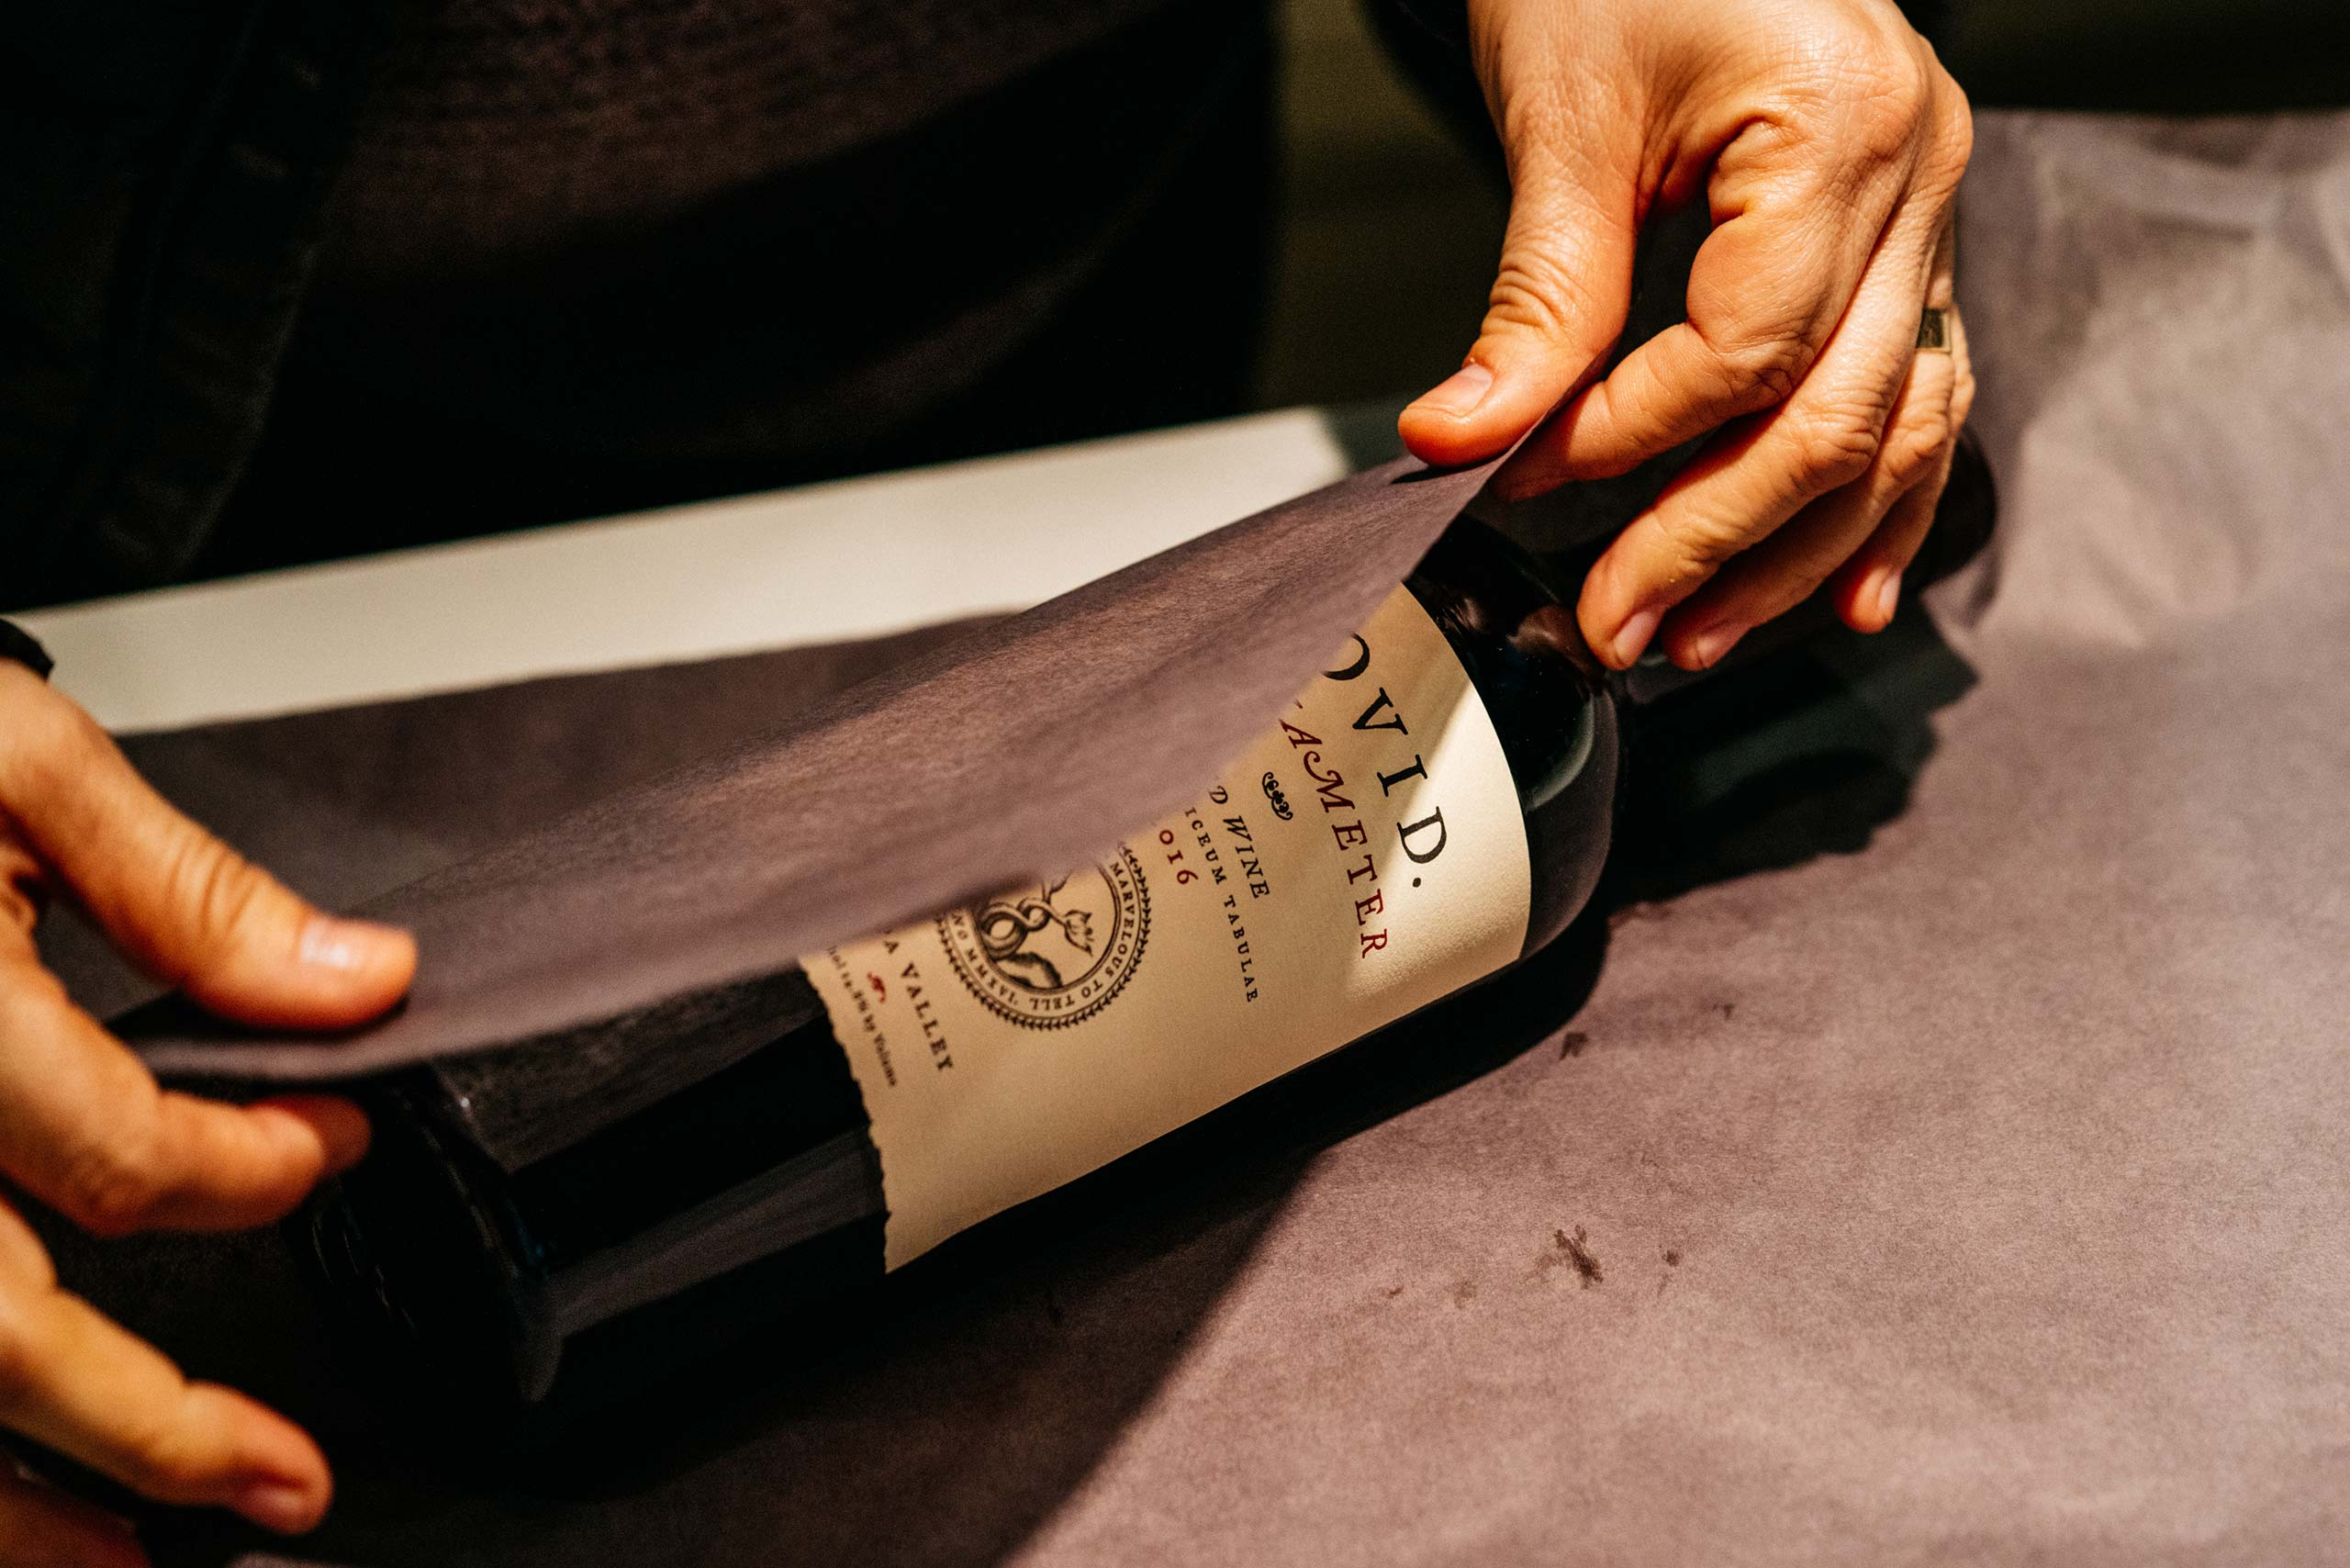 Wrapping Hexameter wine bottle